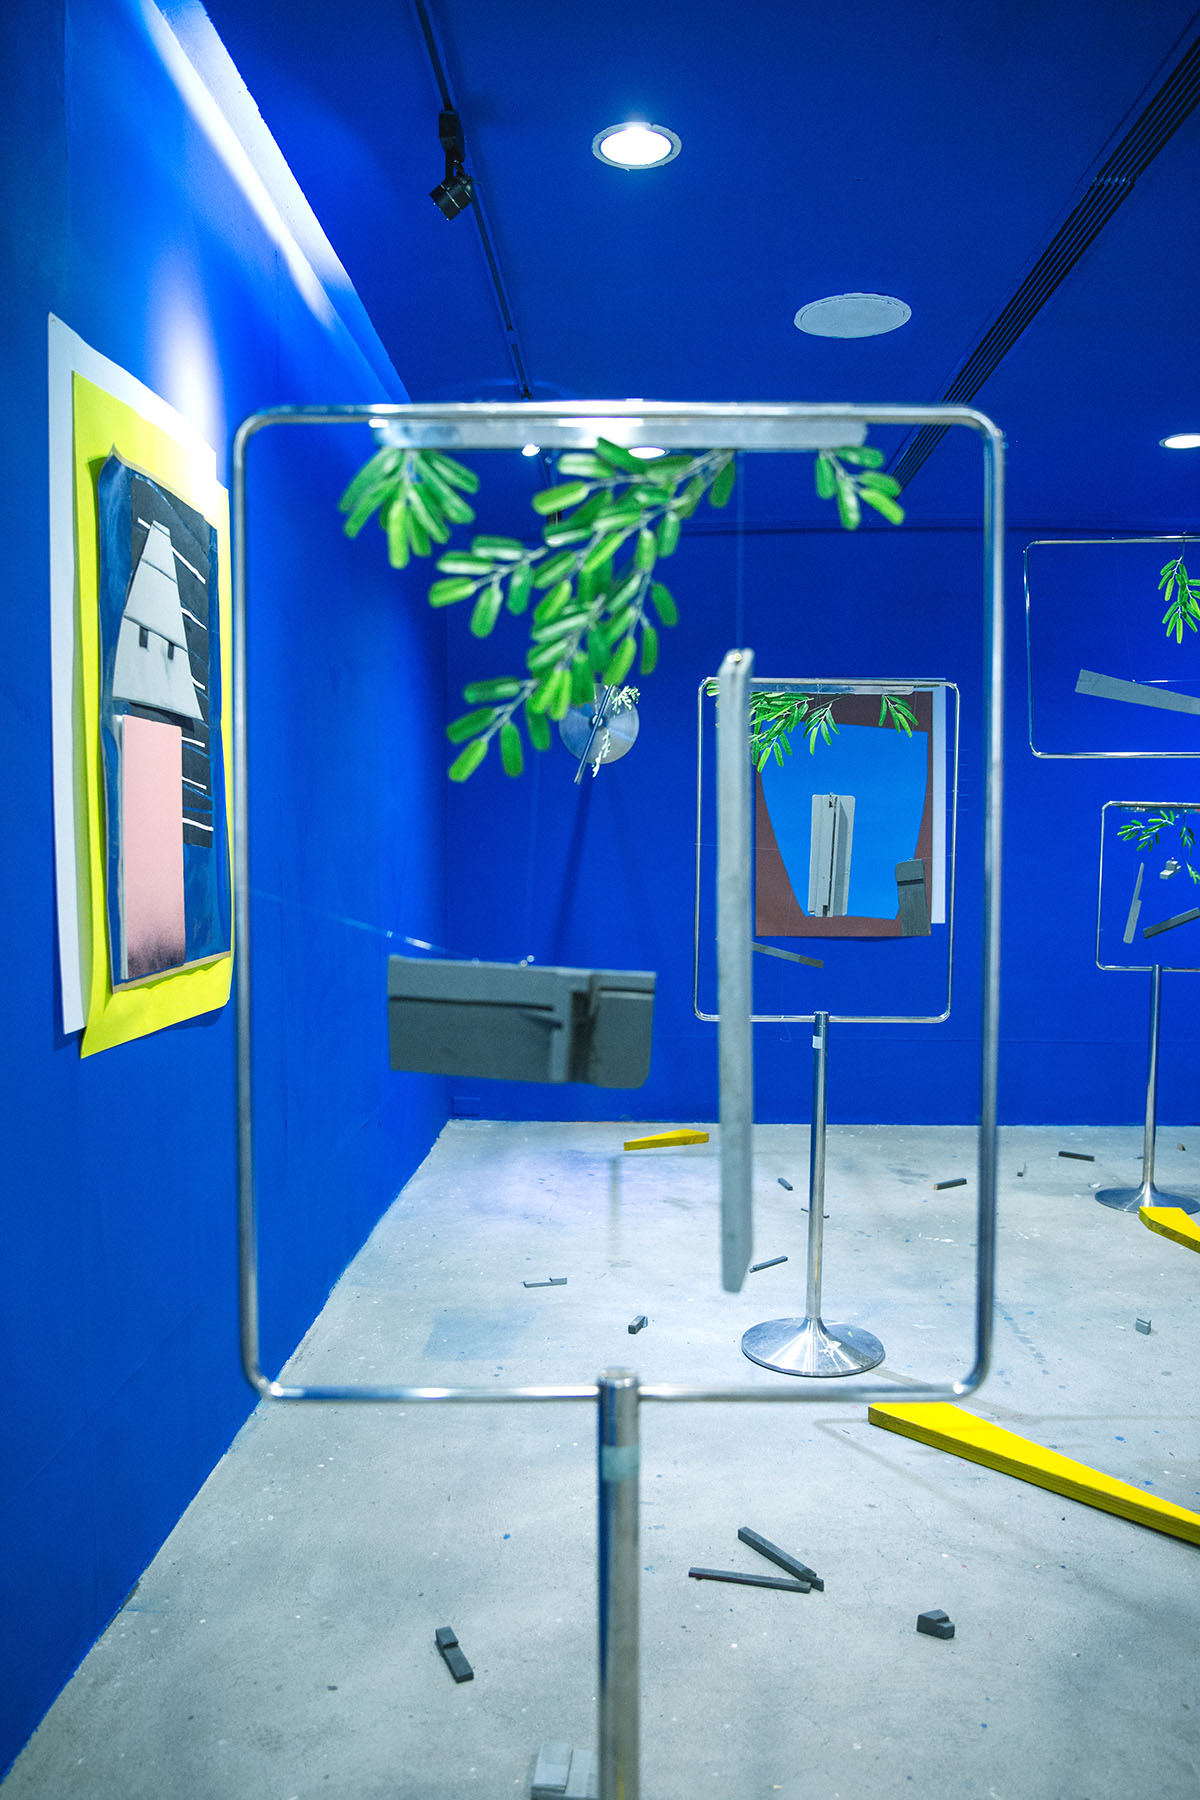 ON DISPLAY (ABORIGINALITY) Various works and materials, Installation view Barry Room, Taipei Artist Village Treasure Hill, Taipei, Taiwan, 2016 ( Foto: Kairon Liu)